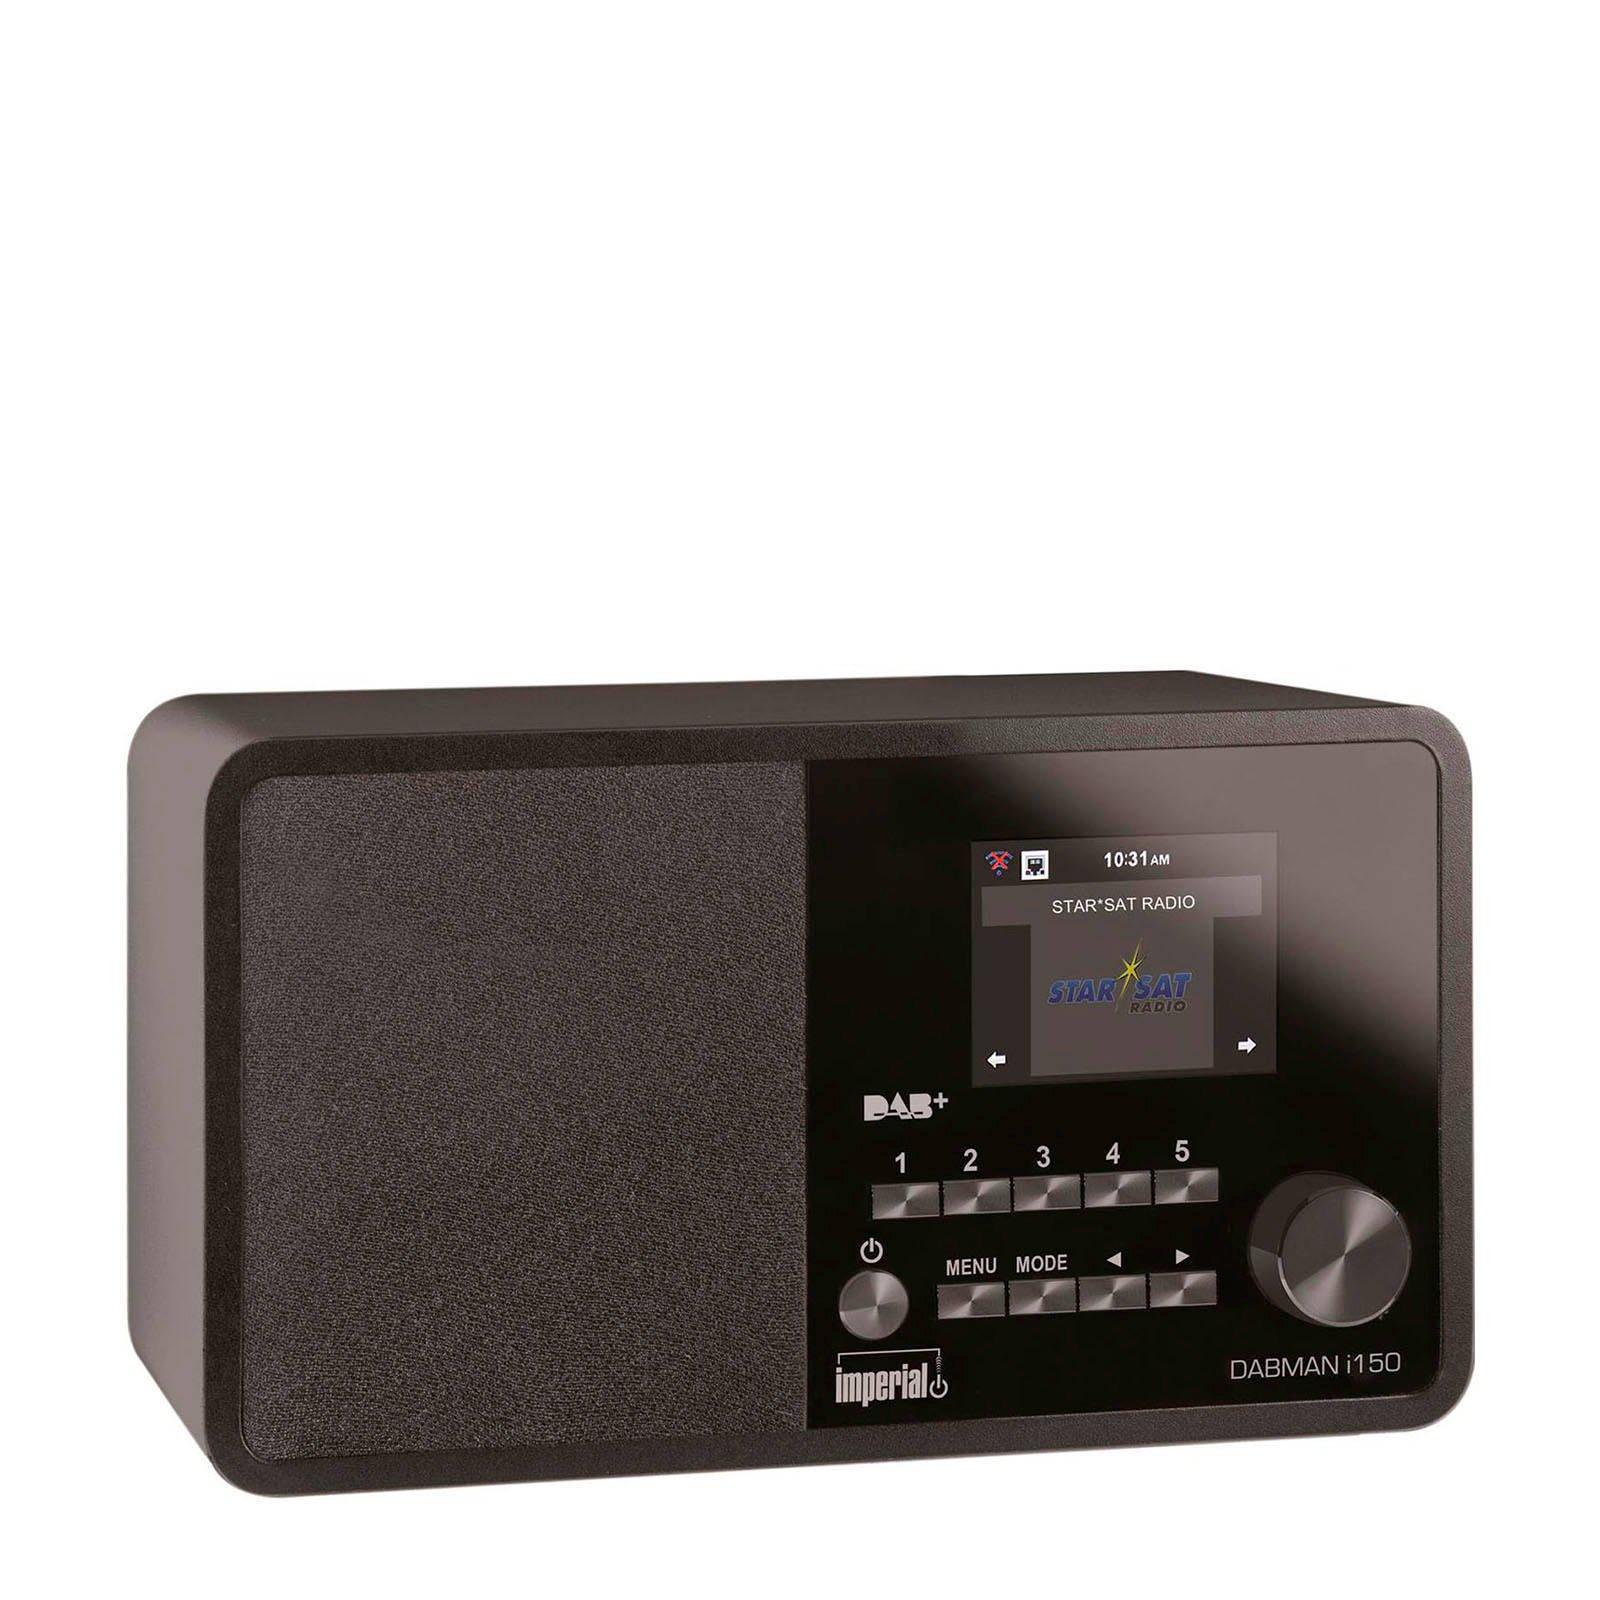 Imperial Dabman I150 DAB+ radio @ Expert